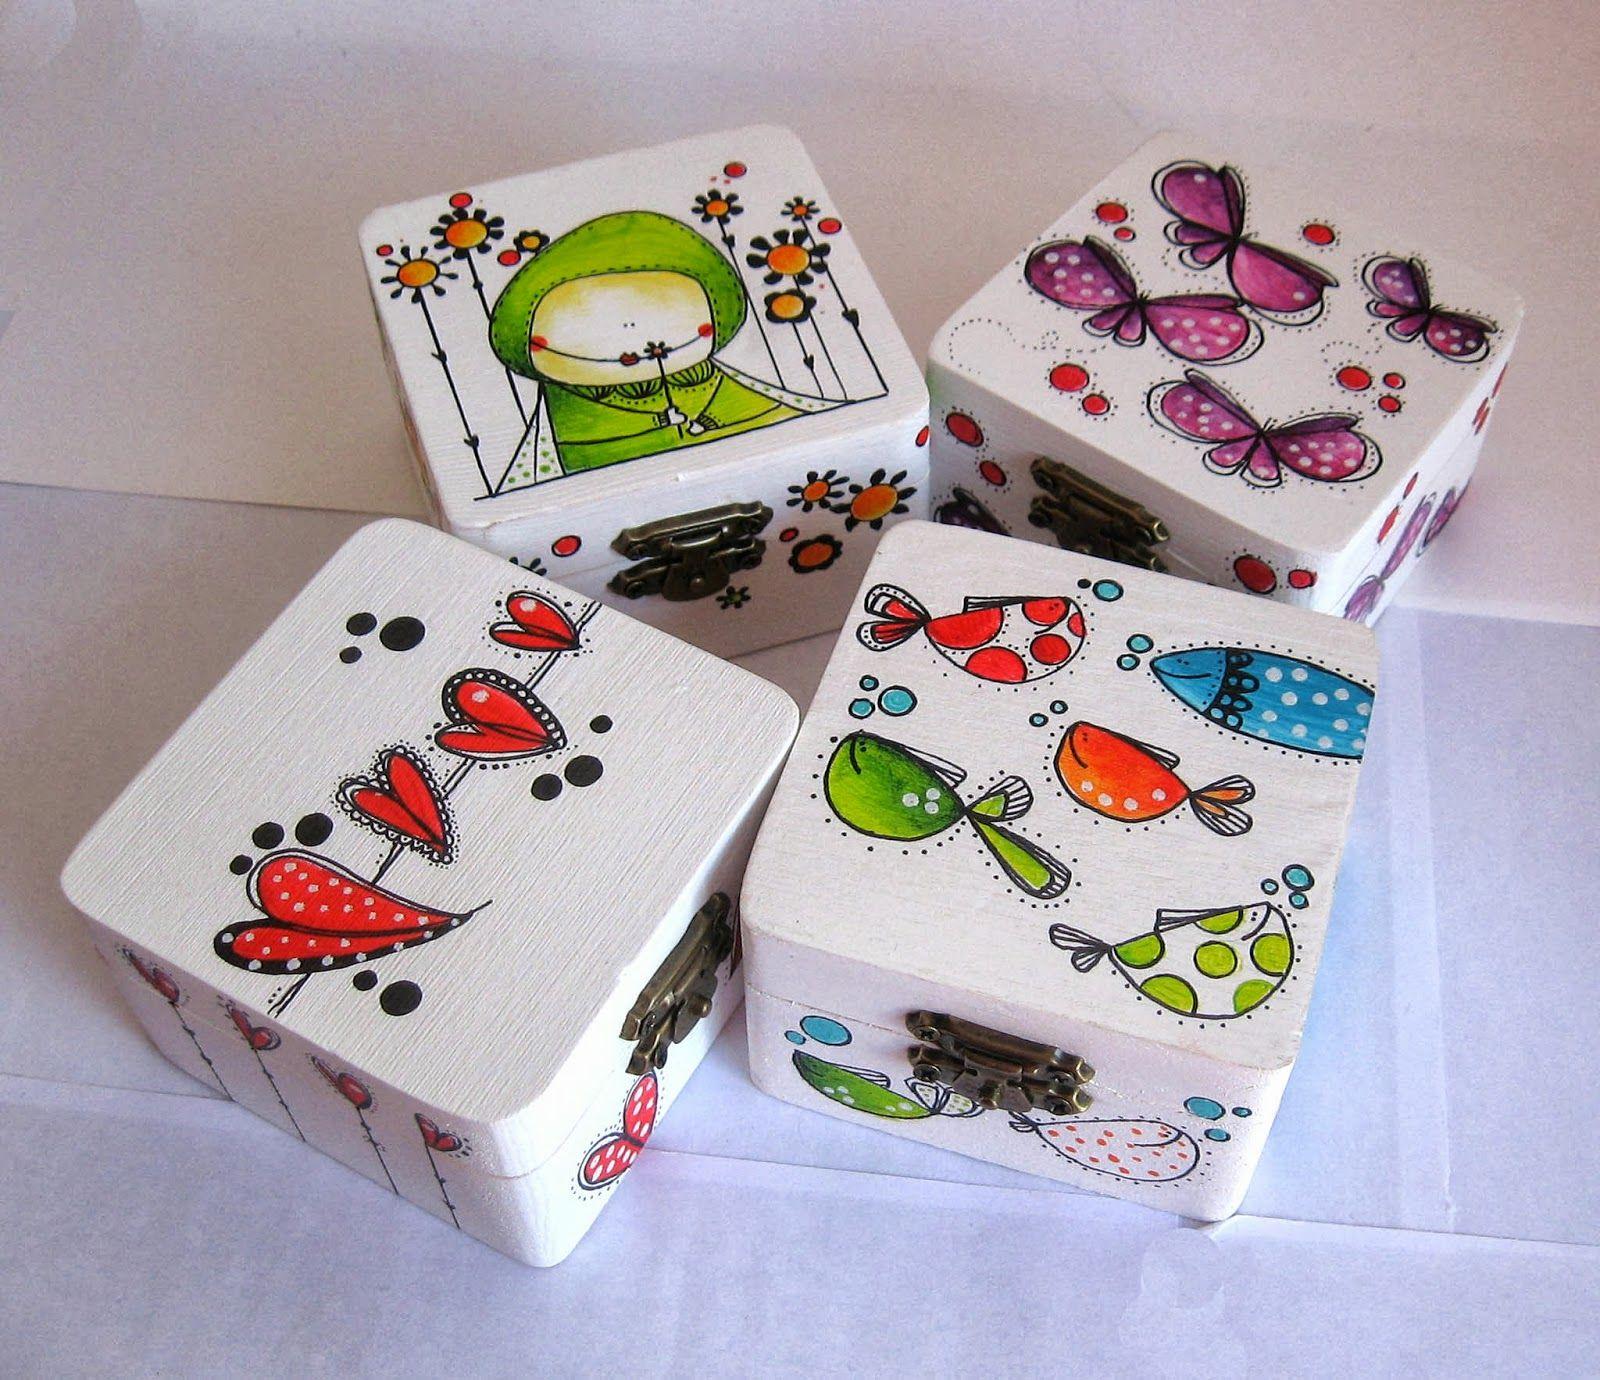 Pin de agustina fernandez en cajas decoradas decoupage - Cajas decoradas a mano ...